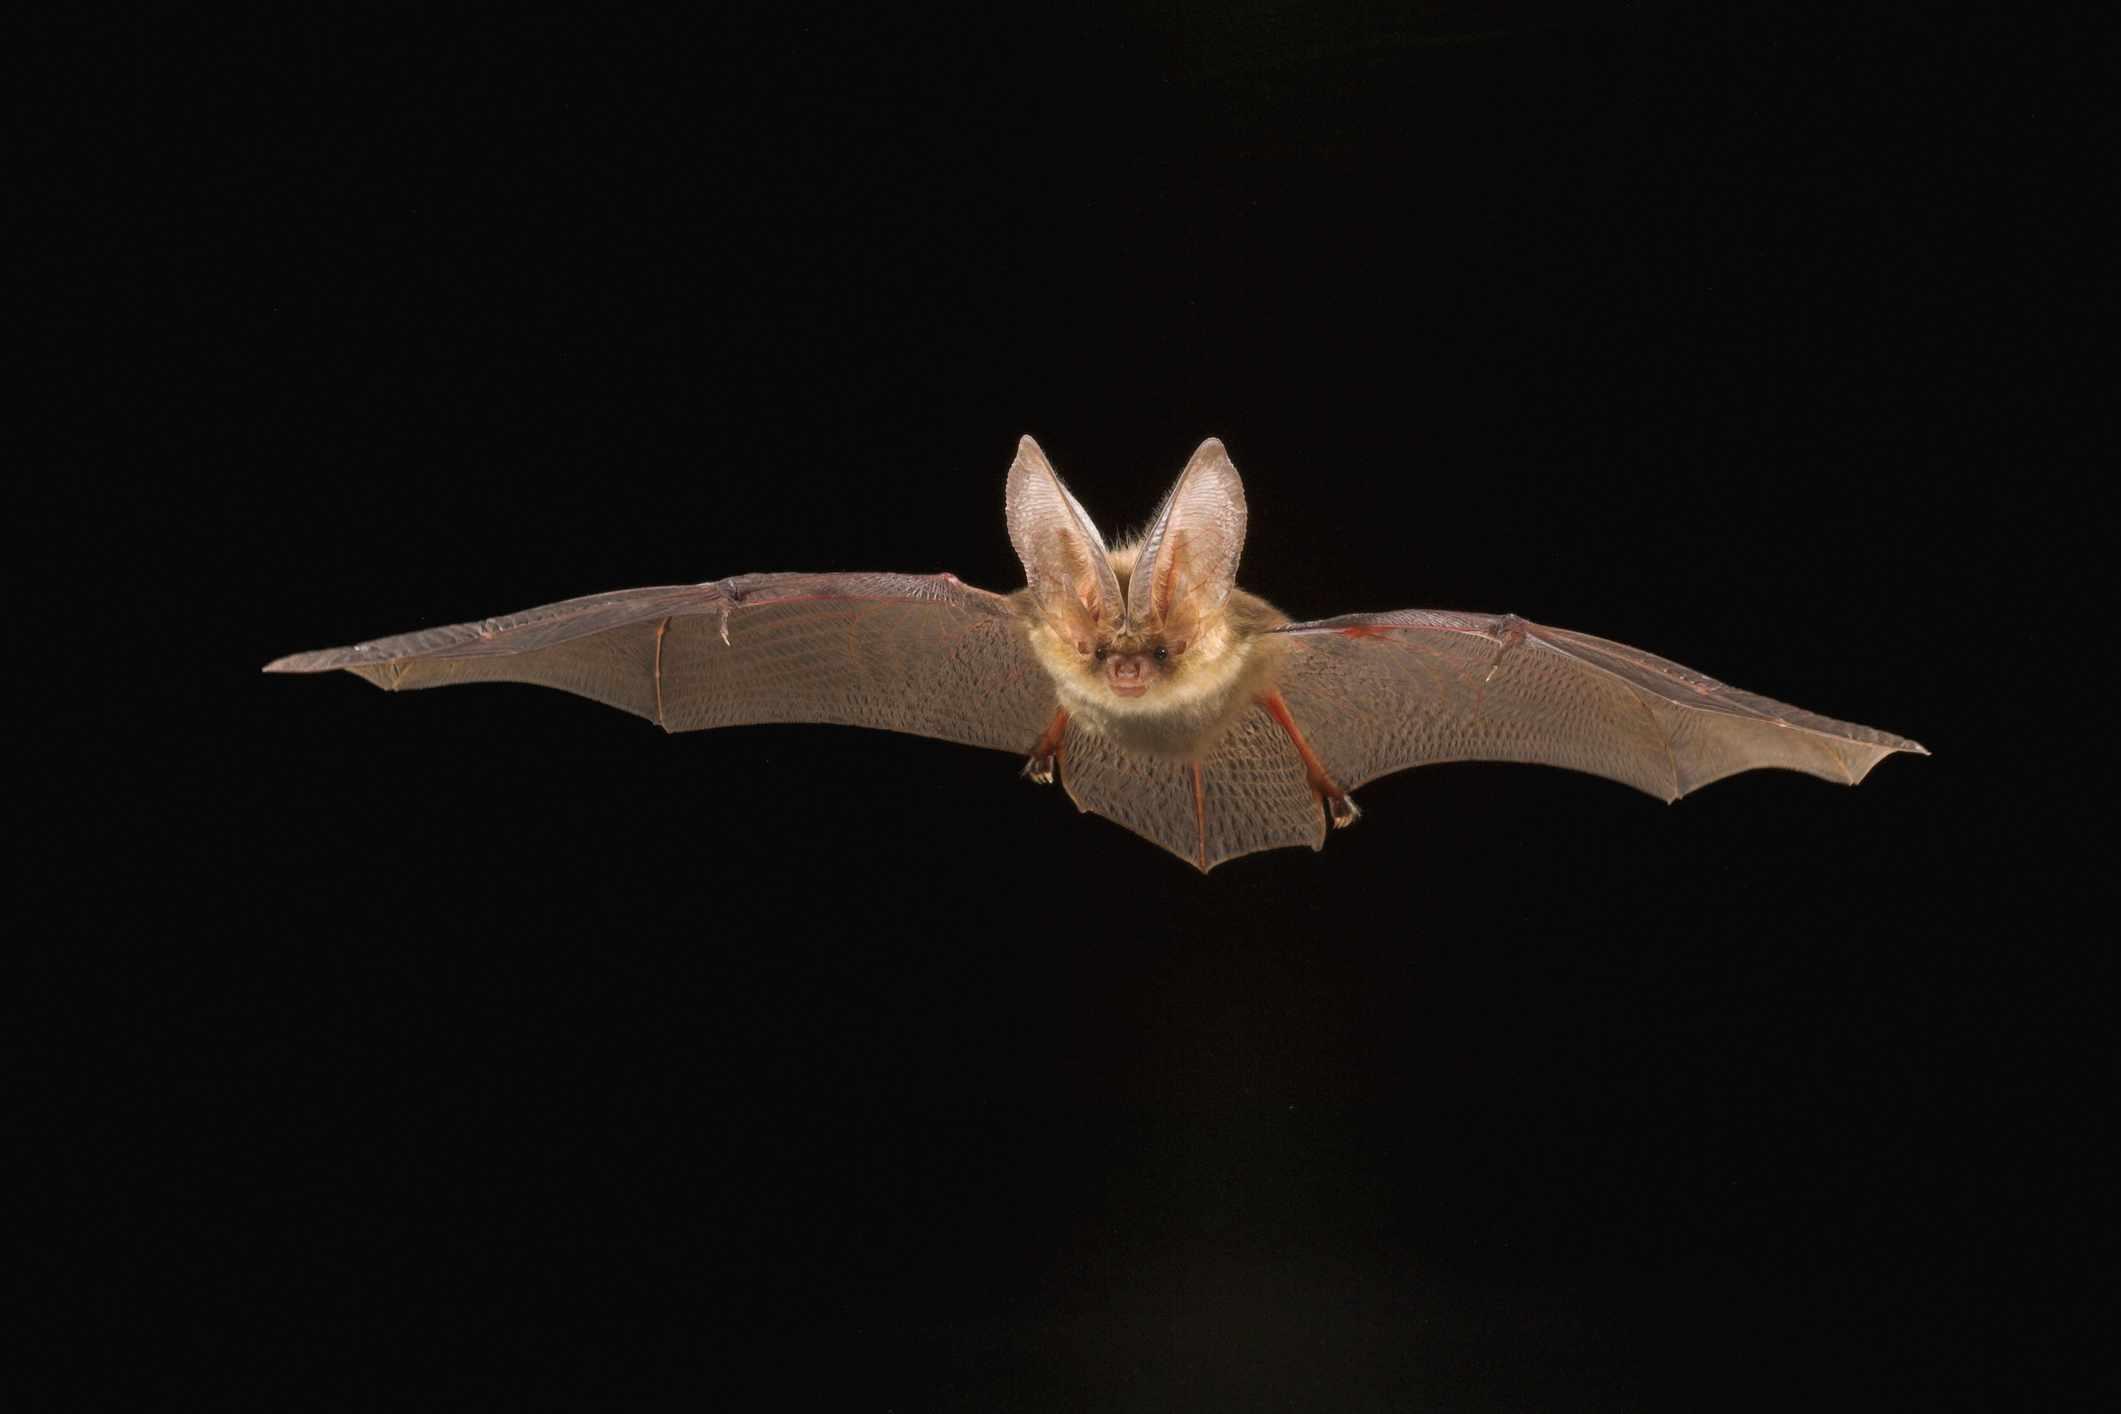 Brown long-eared bat. © Yves Adams/Getty